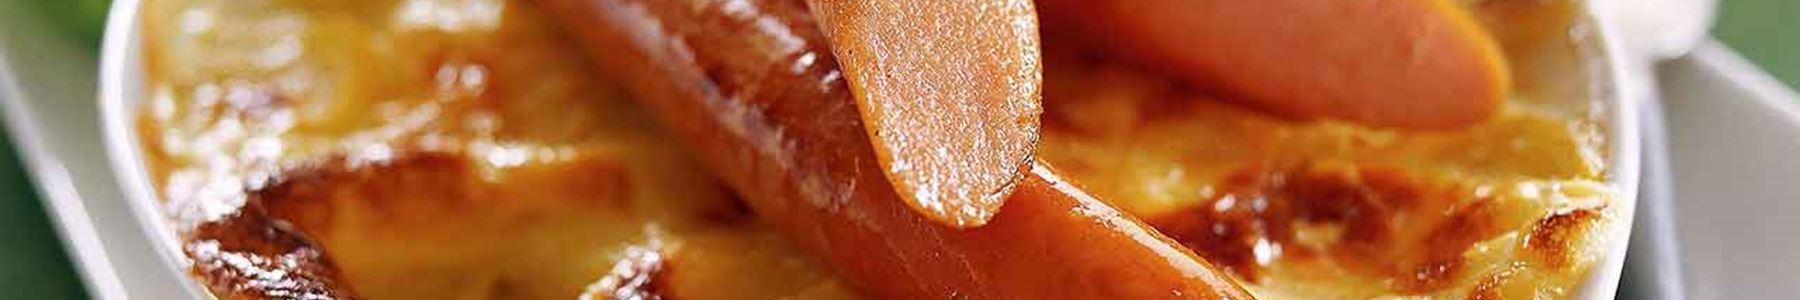 Wienerkorv + Potatis